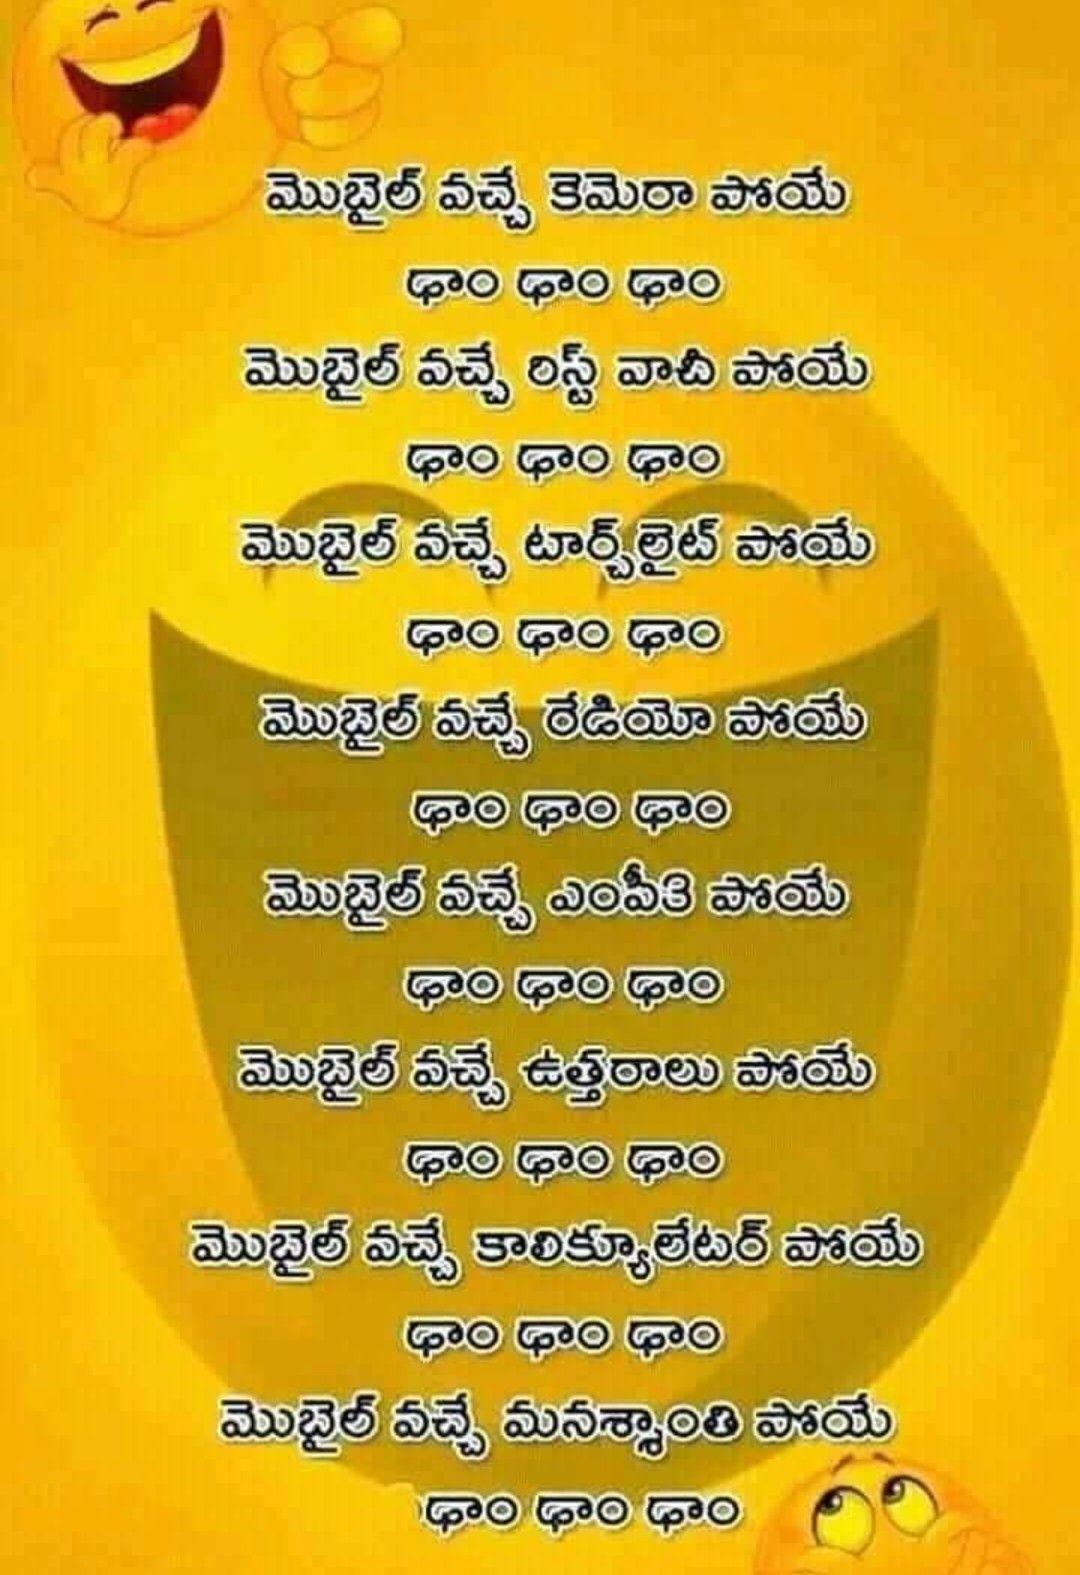 Pin by ajay on Telugu jokes Telugu jokes, Kids poems